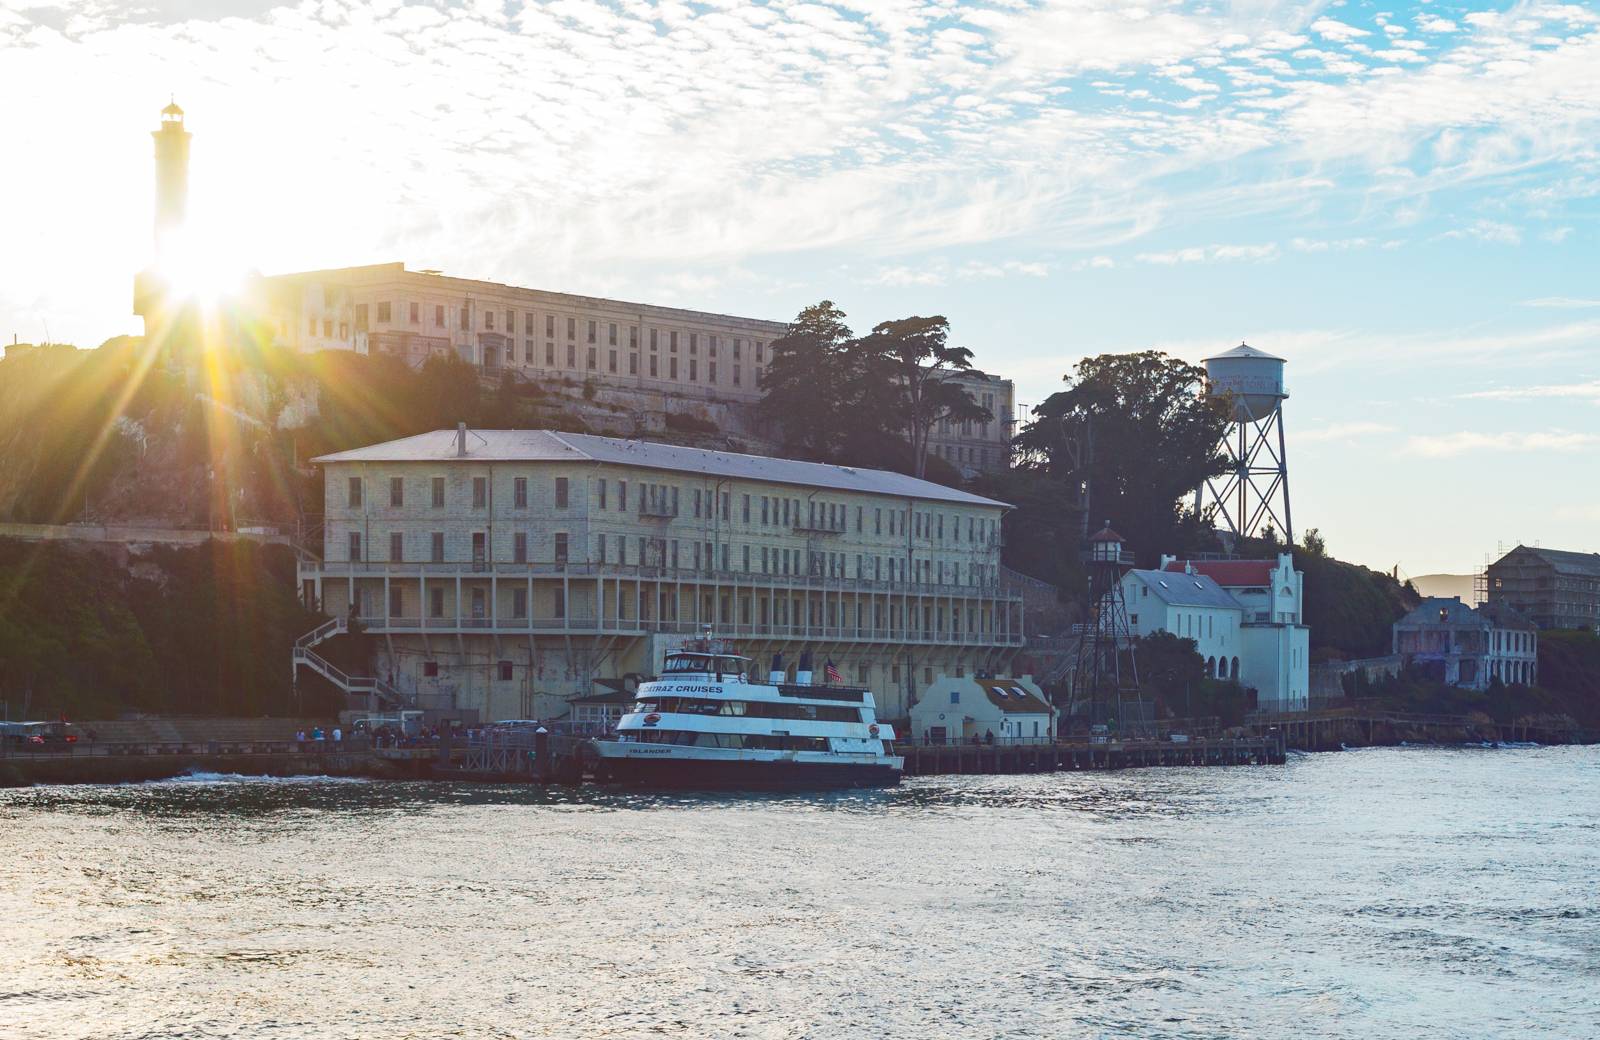 SF Bay Alcatraz - The Towers at Rincon Apartments